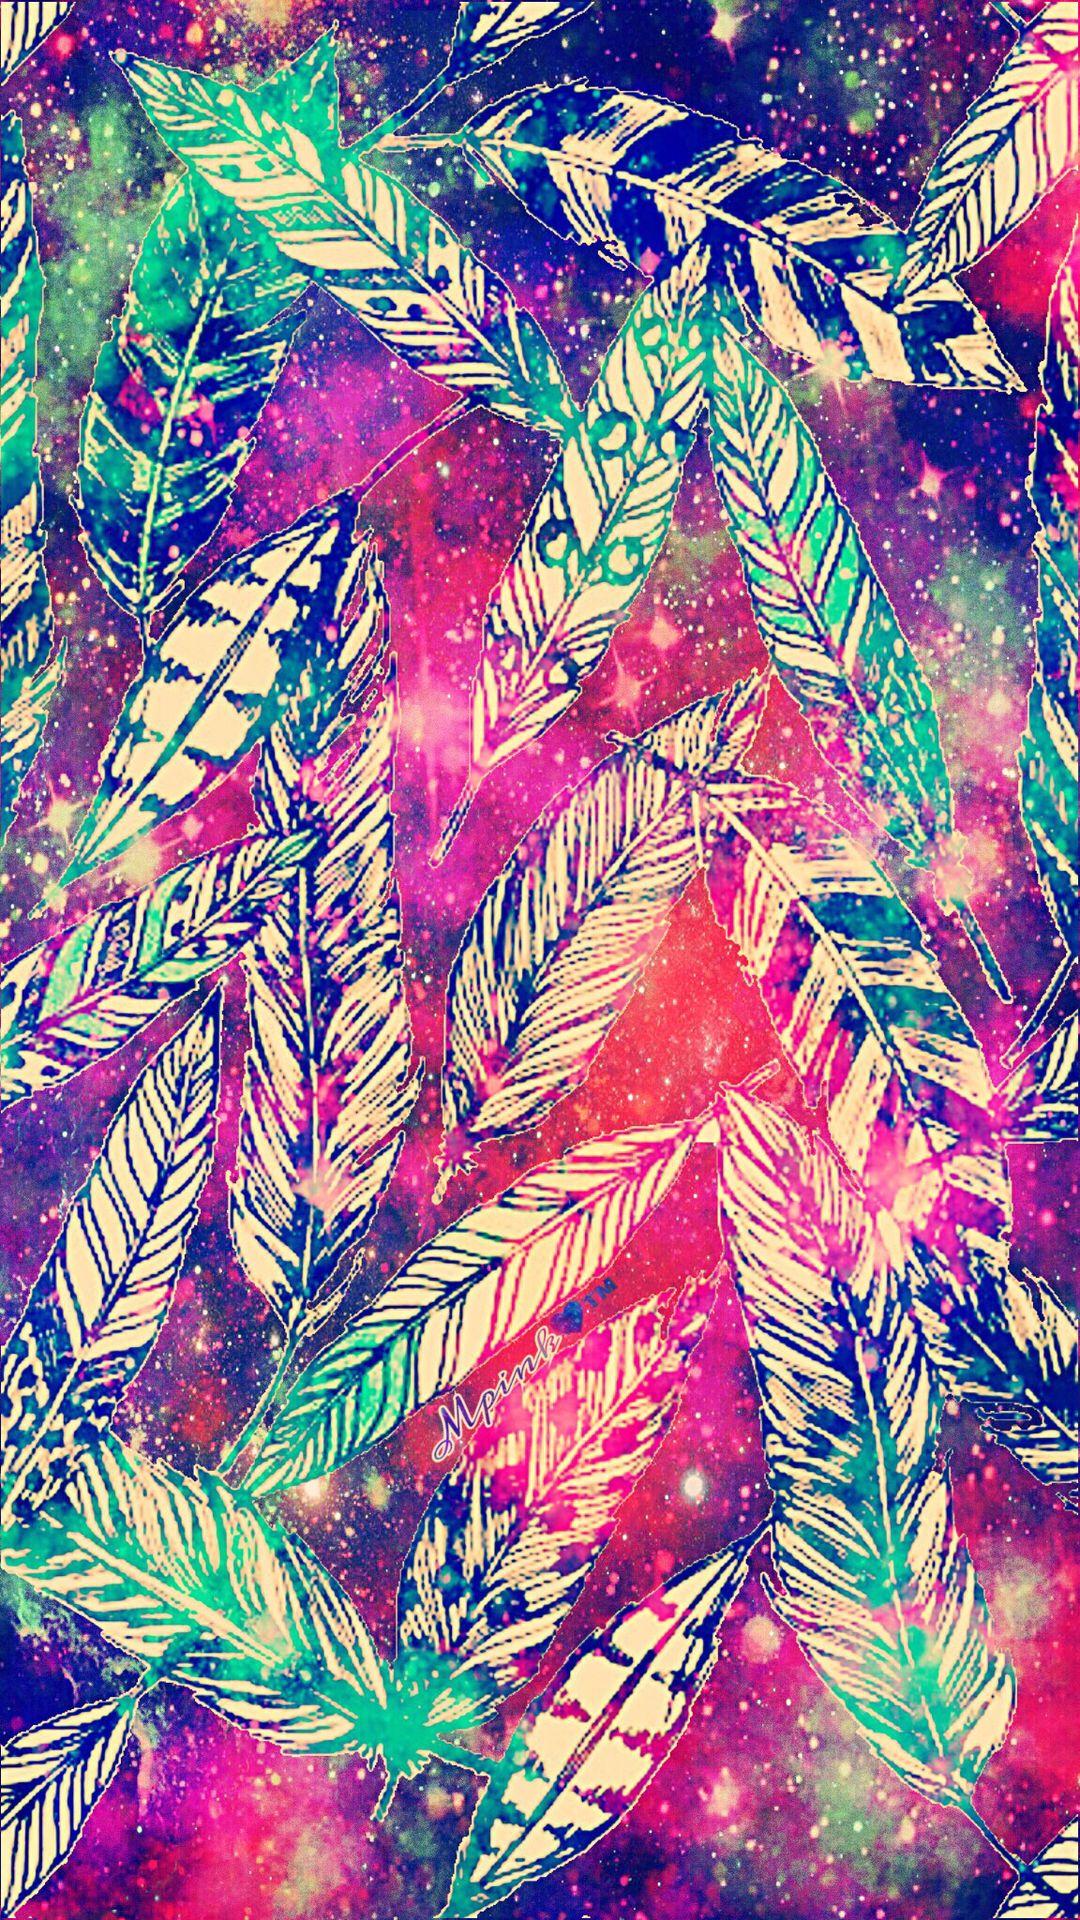 Falling Feathers Galaxy Wallpaper Androidwallpaper Iphonewallpaper Wallpaper Galaxy Sparkle Gli Trippy Iphone Wallpaper Iphone Wallpaper Galaxy Wallpaper